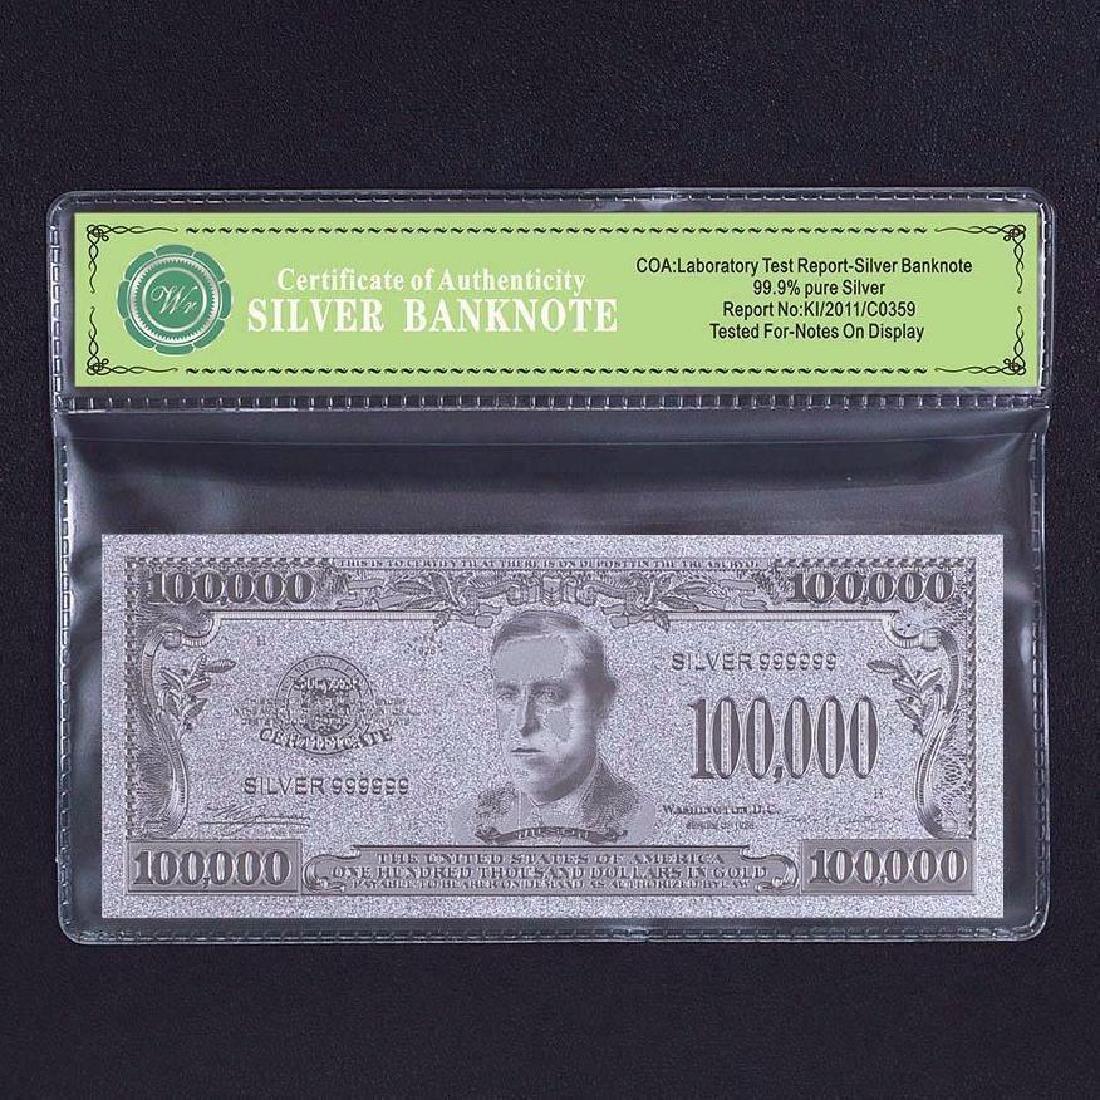 USA $100,000 24K Silver Clad Banknote